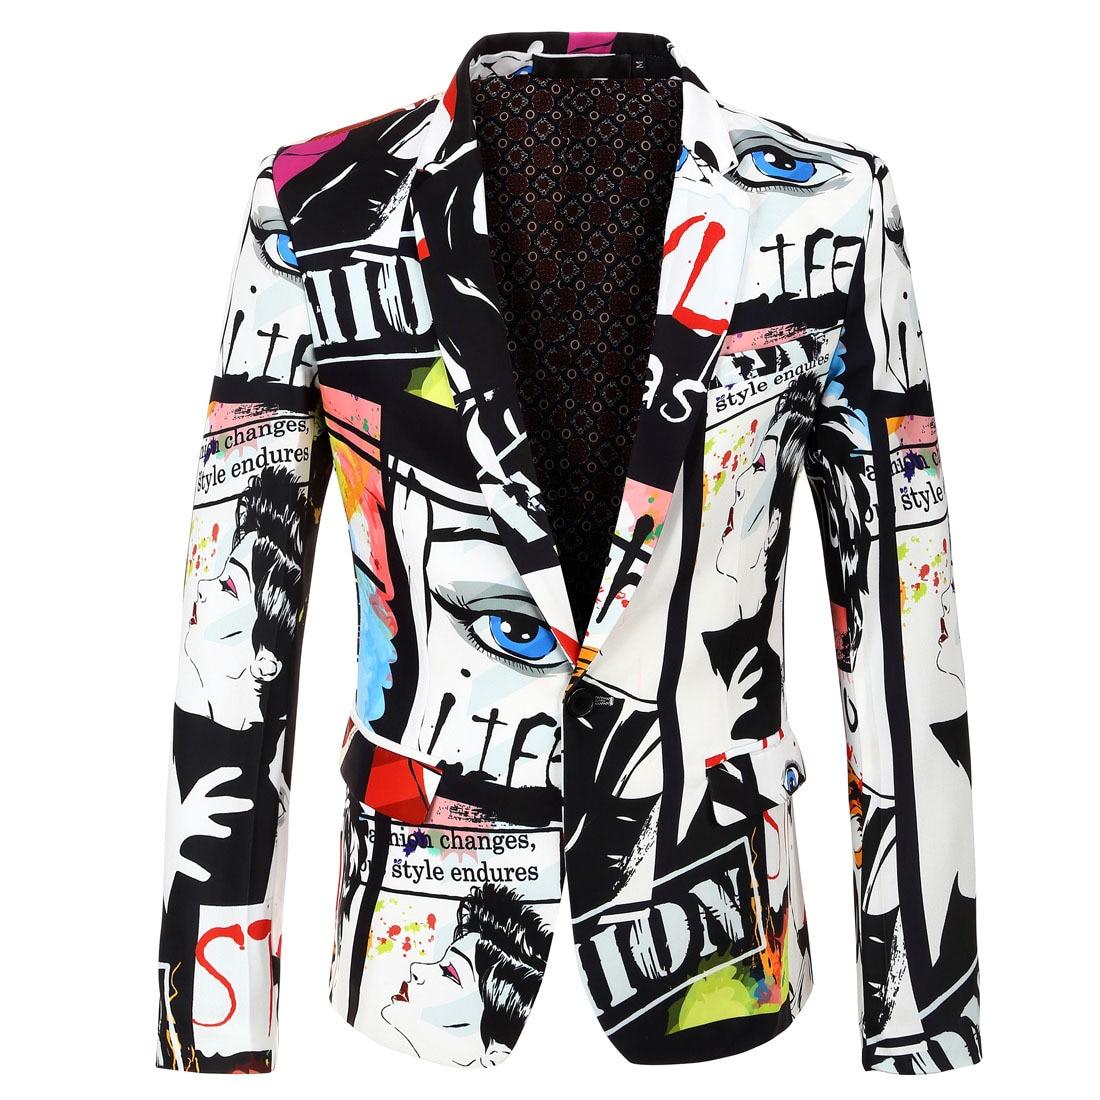 Blazer Jacket Suit Spring Graffiti Harajuku-Printing Men's Casual Plus-Size Fashion